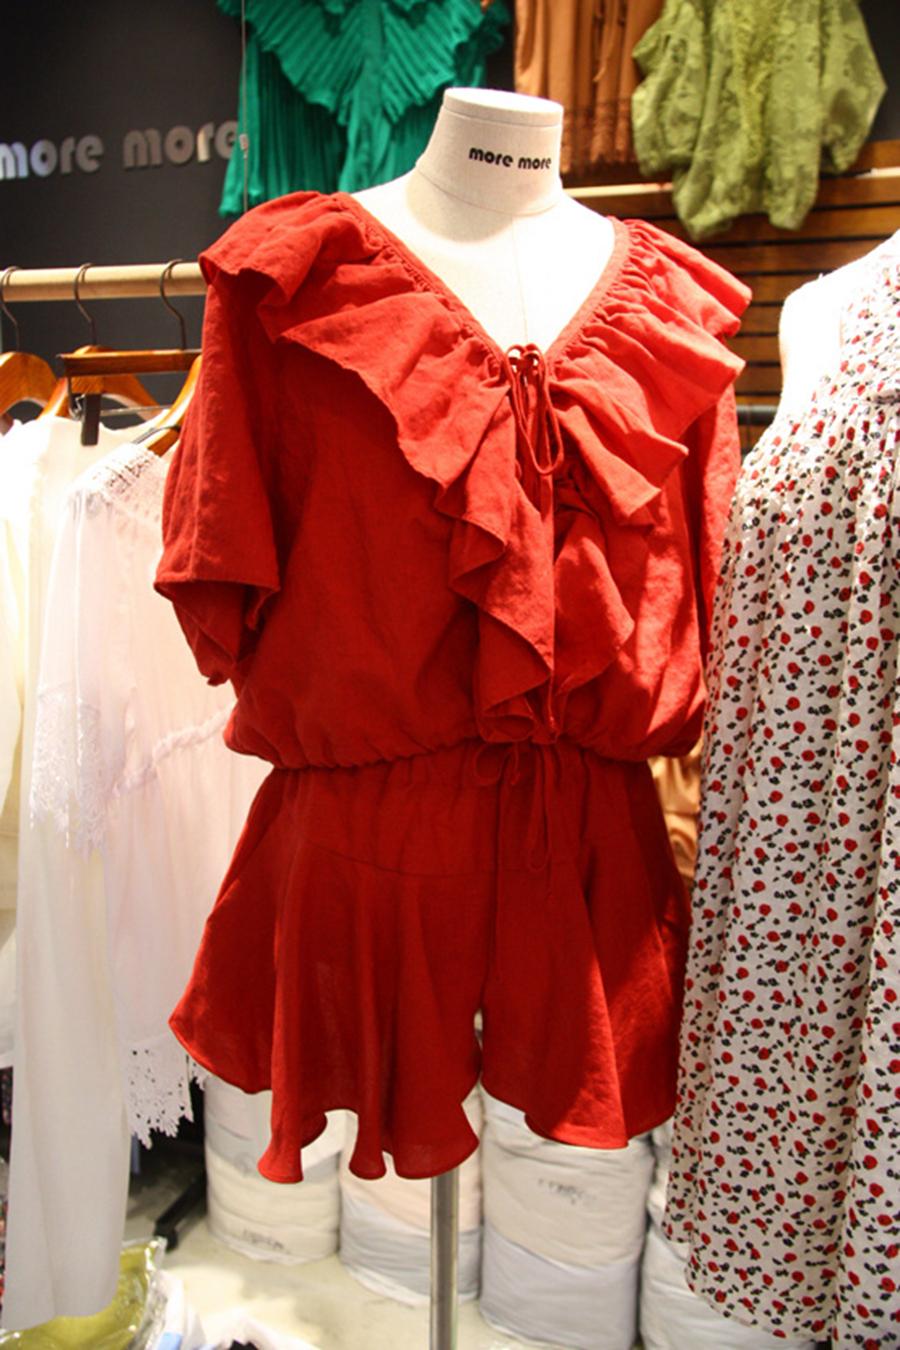 New Korean summer 2019 dongdamen two piece dress with ruffle, cotton and hemp